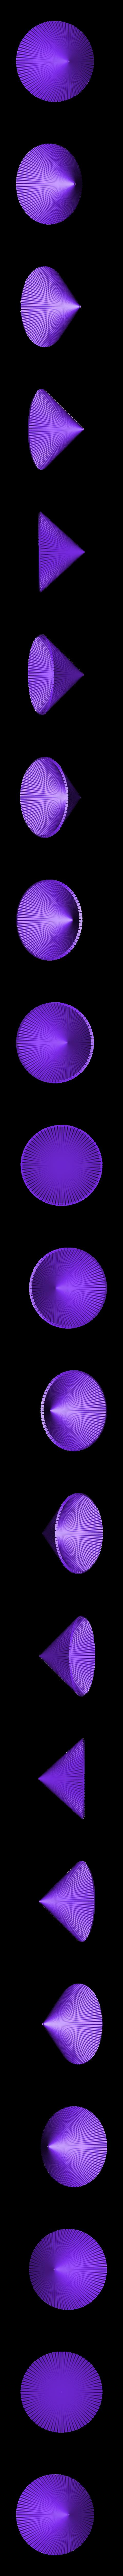 roof_lev1.stl Download free STL file The Crannog • 3D printable template, Earsling